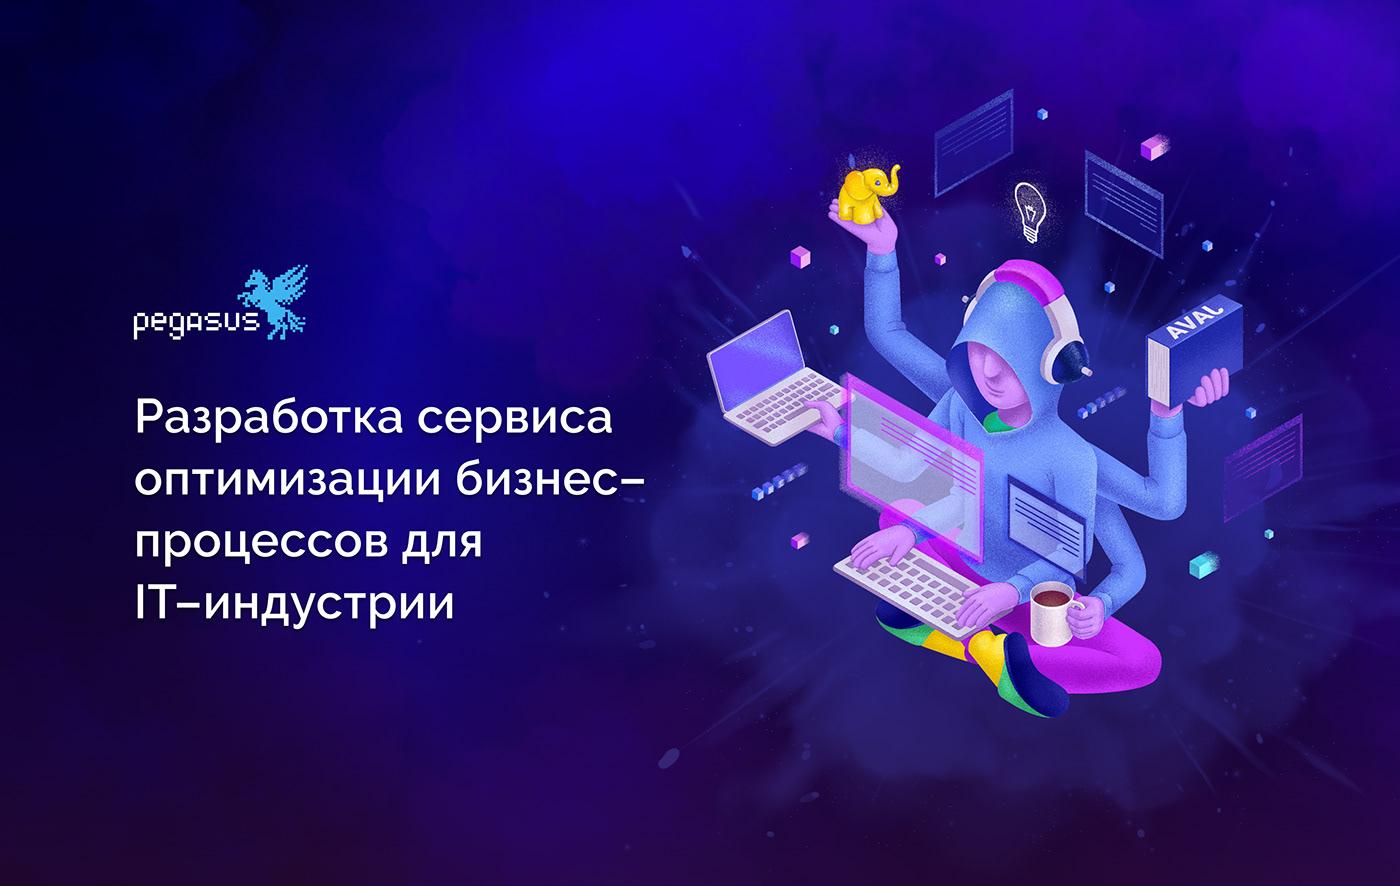 animation  brand identity Character design  design landing page logo Logotype UI/UX UX design Web Design